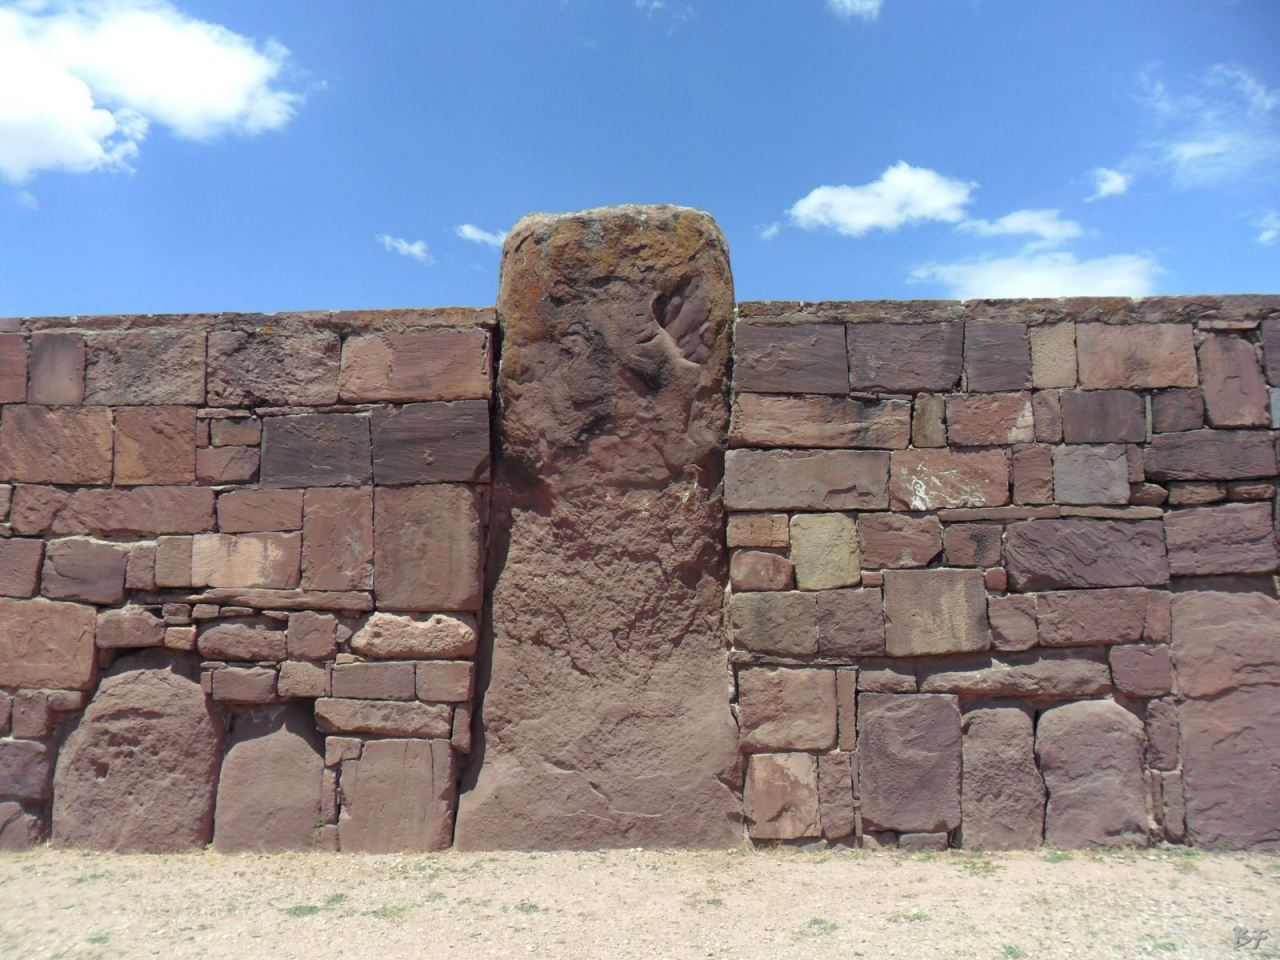 Sito-Megalitico-Piramide-Akapana-Kalasasaya-Menhir-Tiahuanaco-Bolivia-19